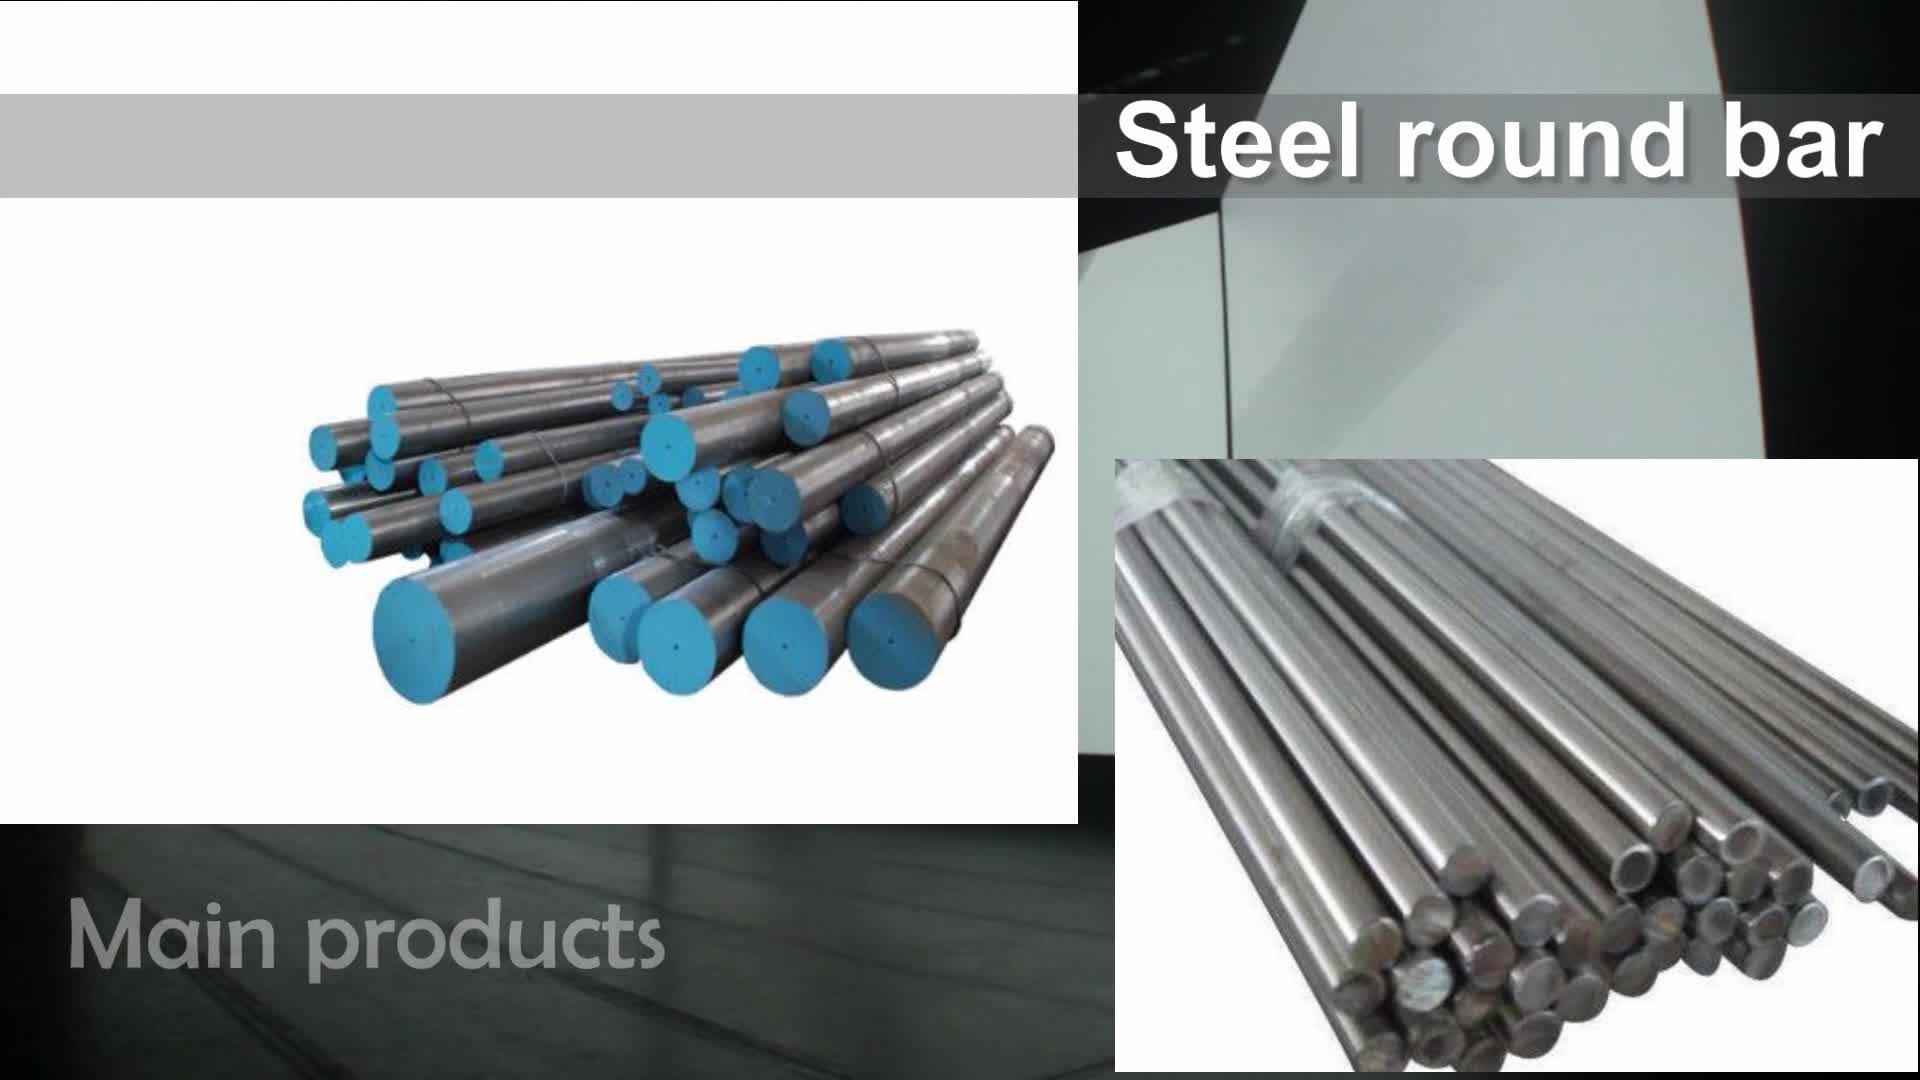 Alloy tool steel 1.2714 steel